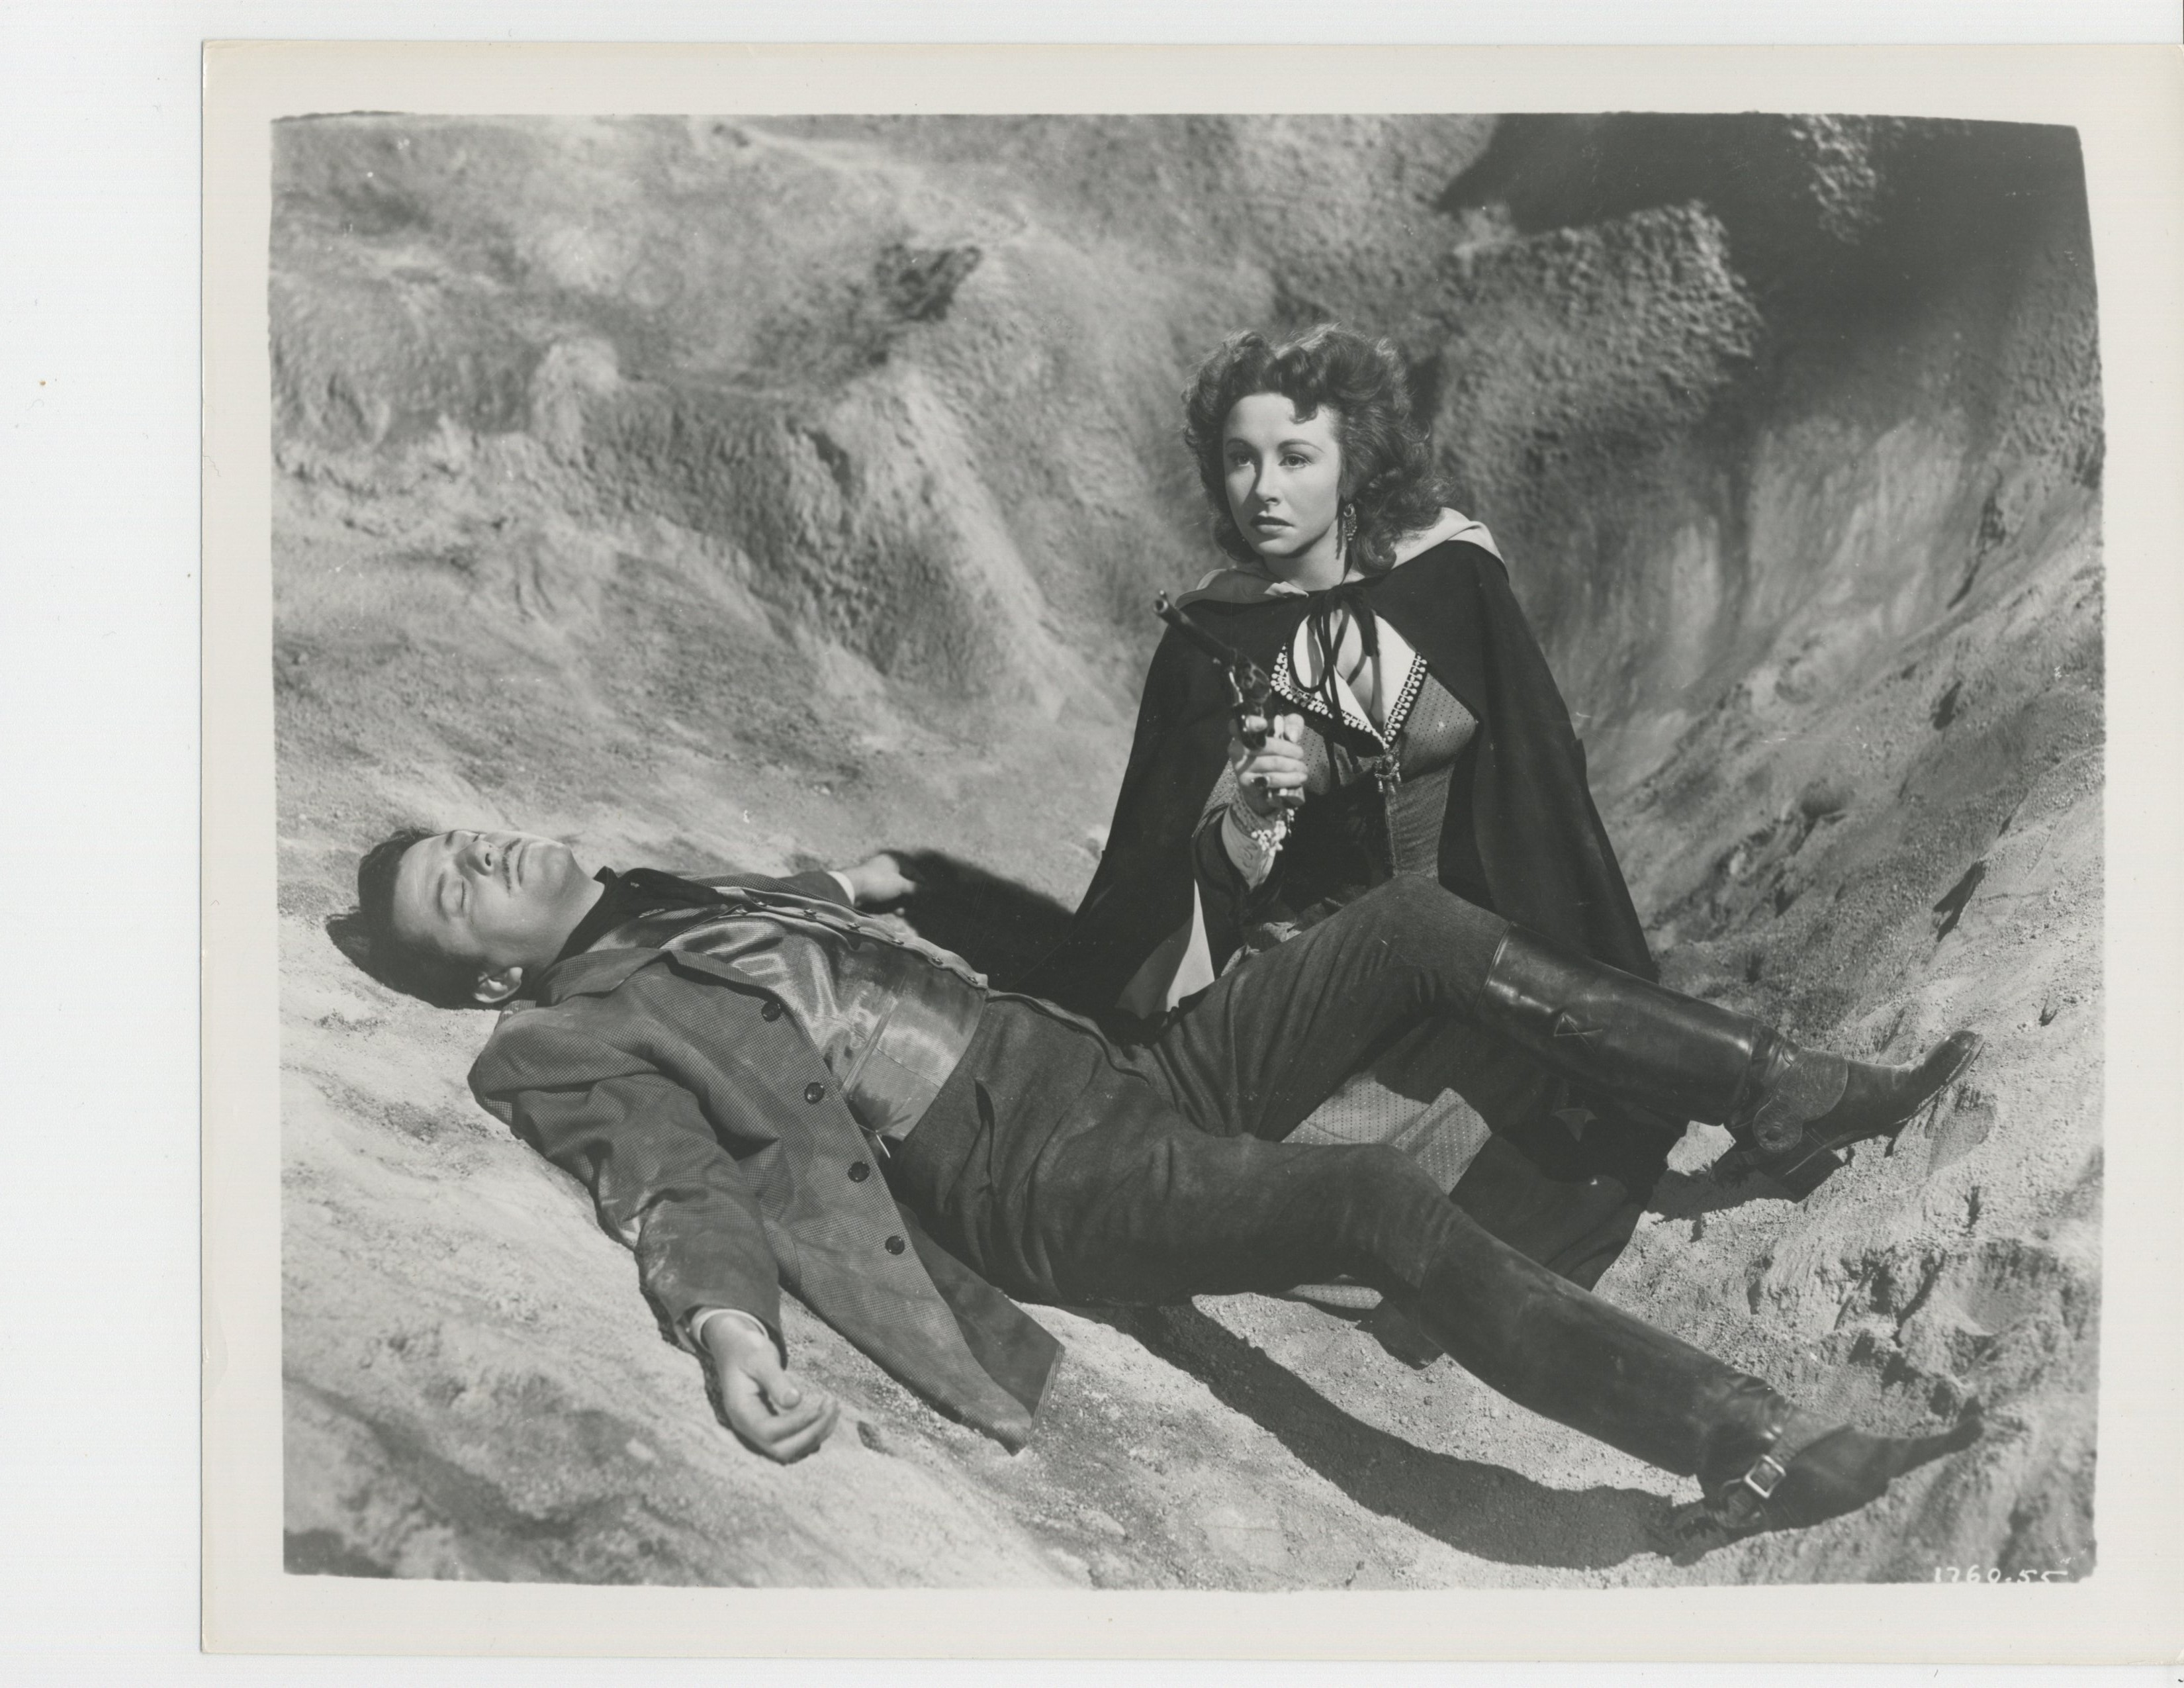 John Carroll and Vera Ralston in Surrender (1950)